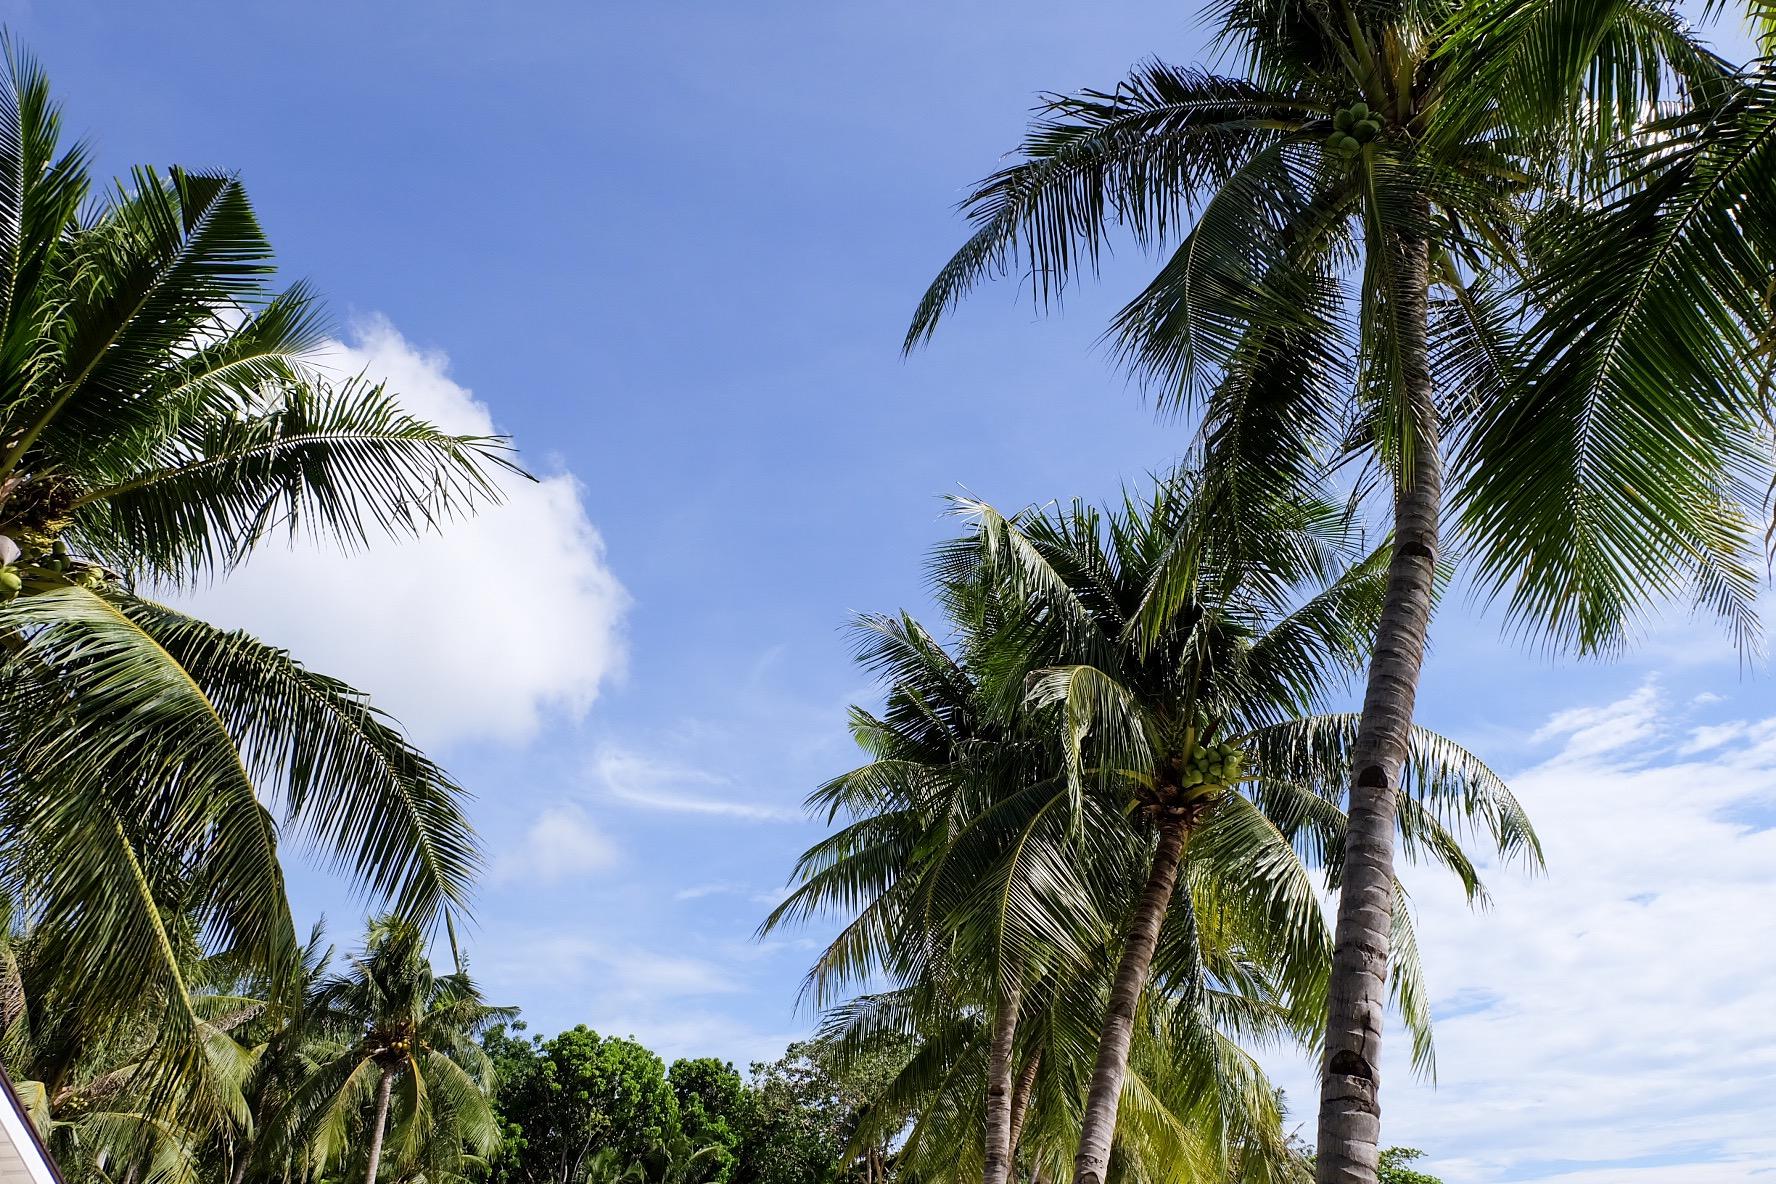 pacific-cebu-resort-iamkimcharlie-16